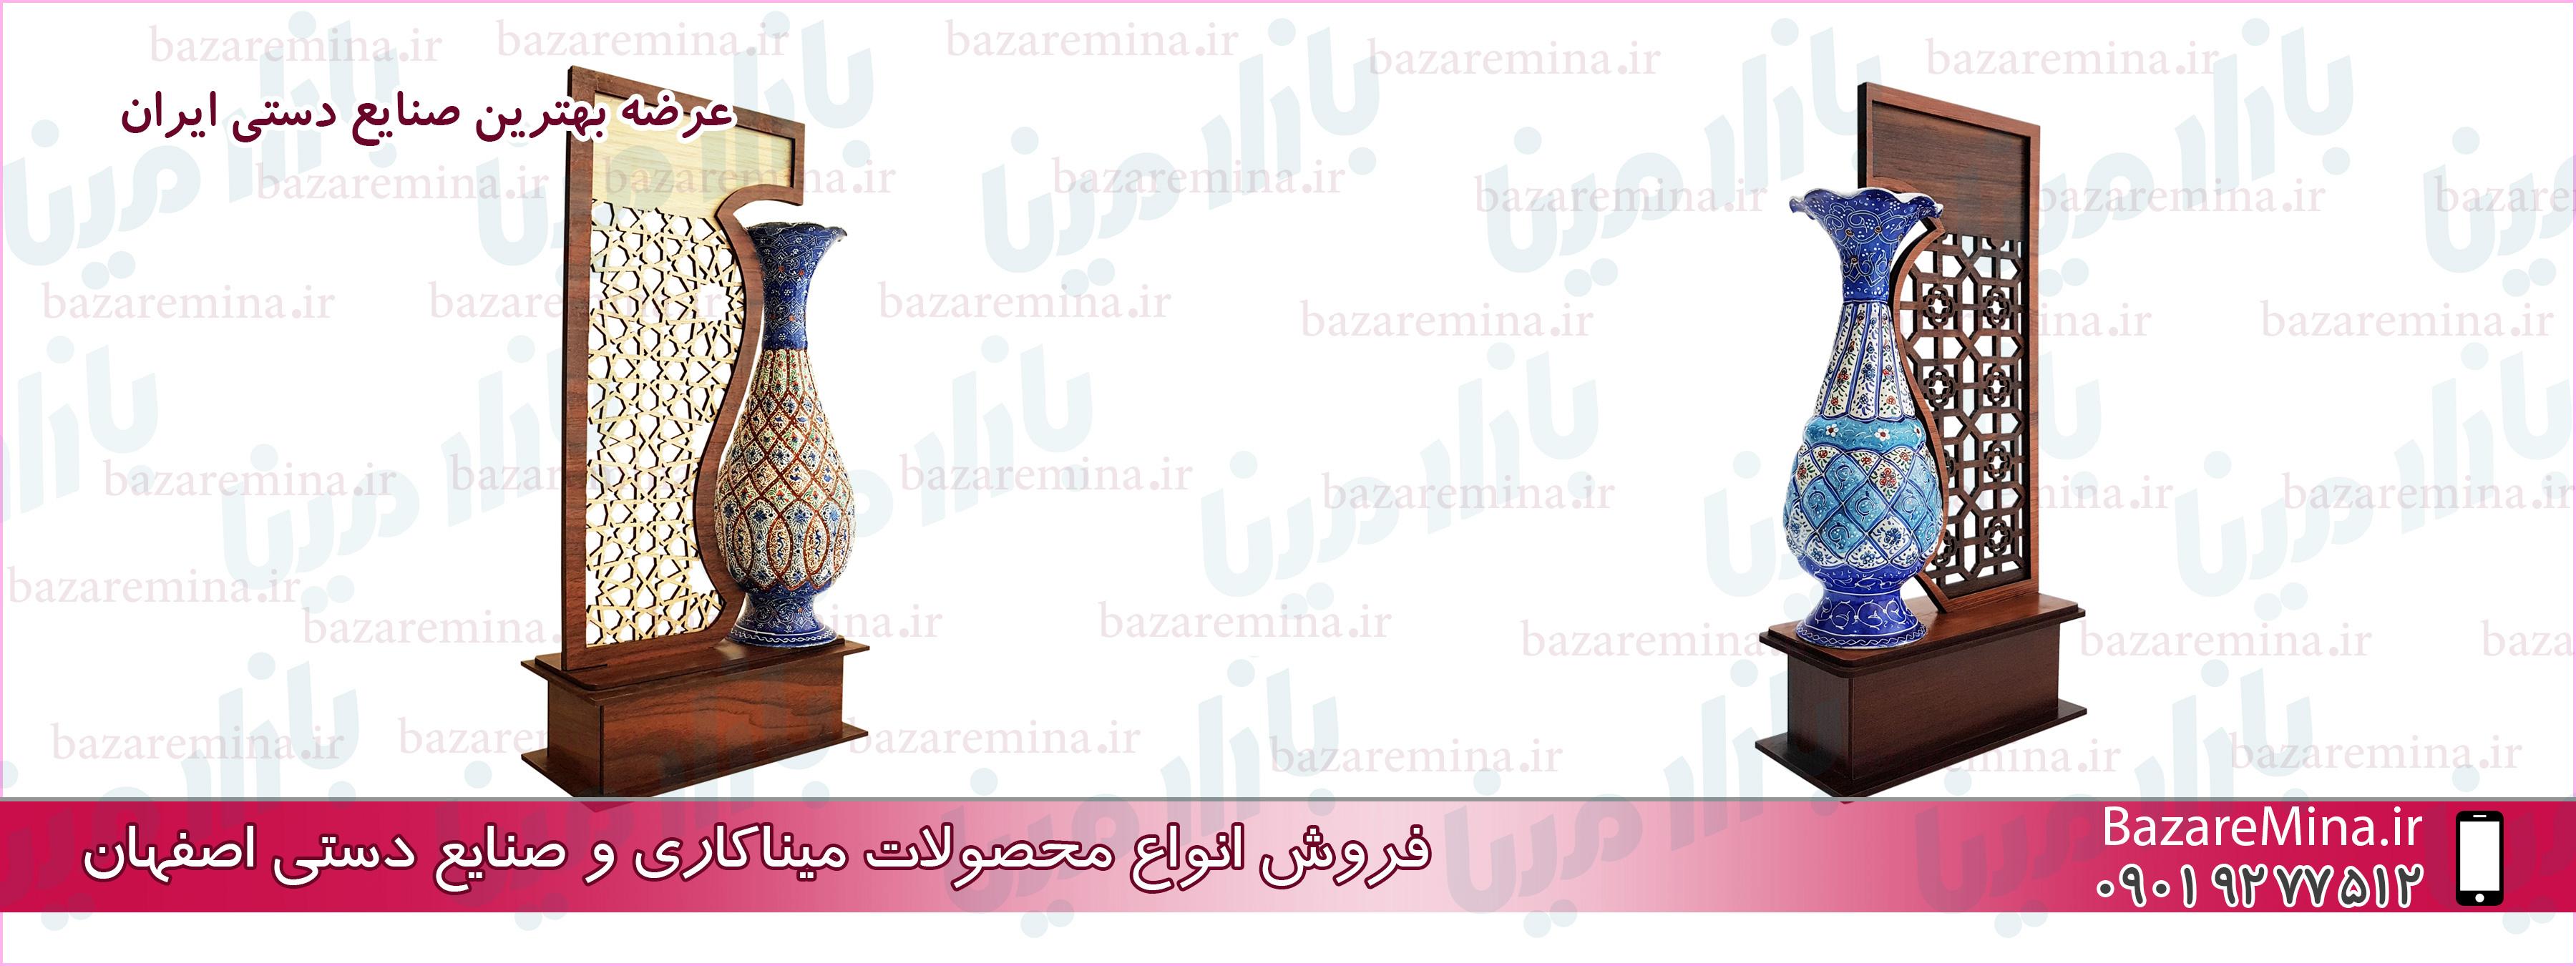 اصفهان میناکاری ظروف